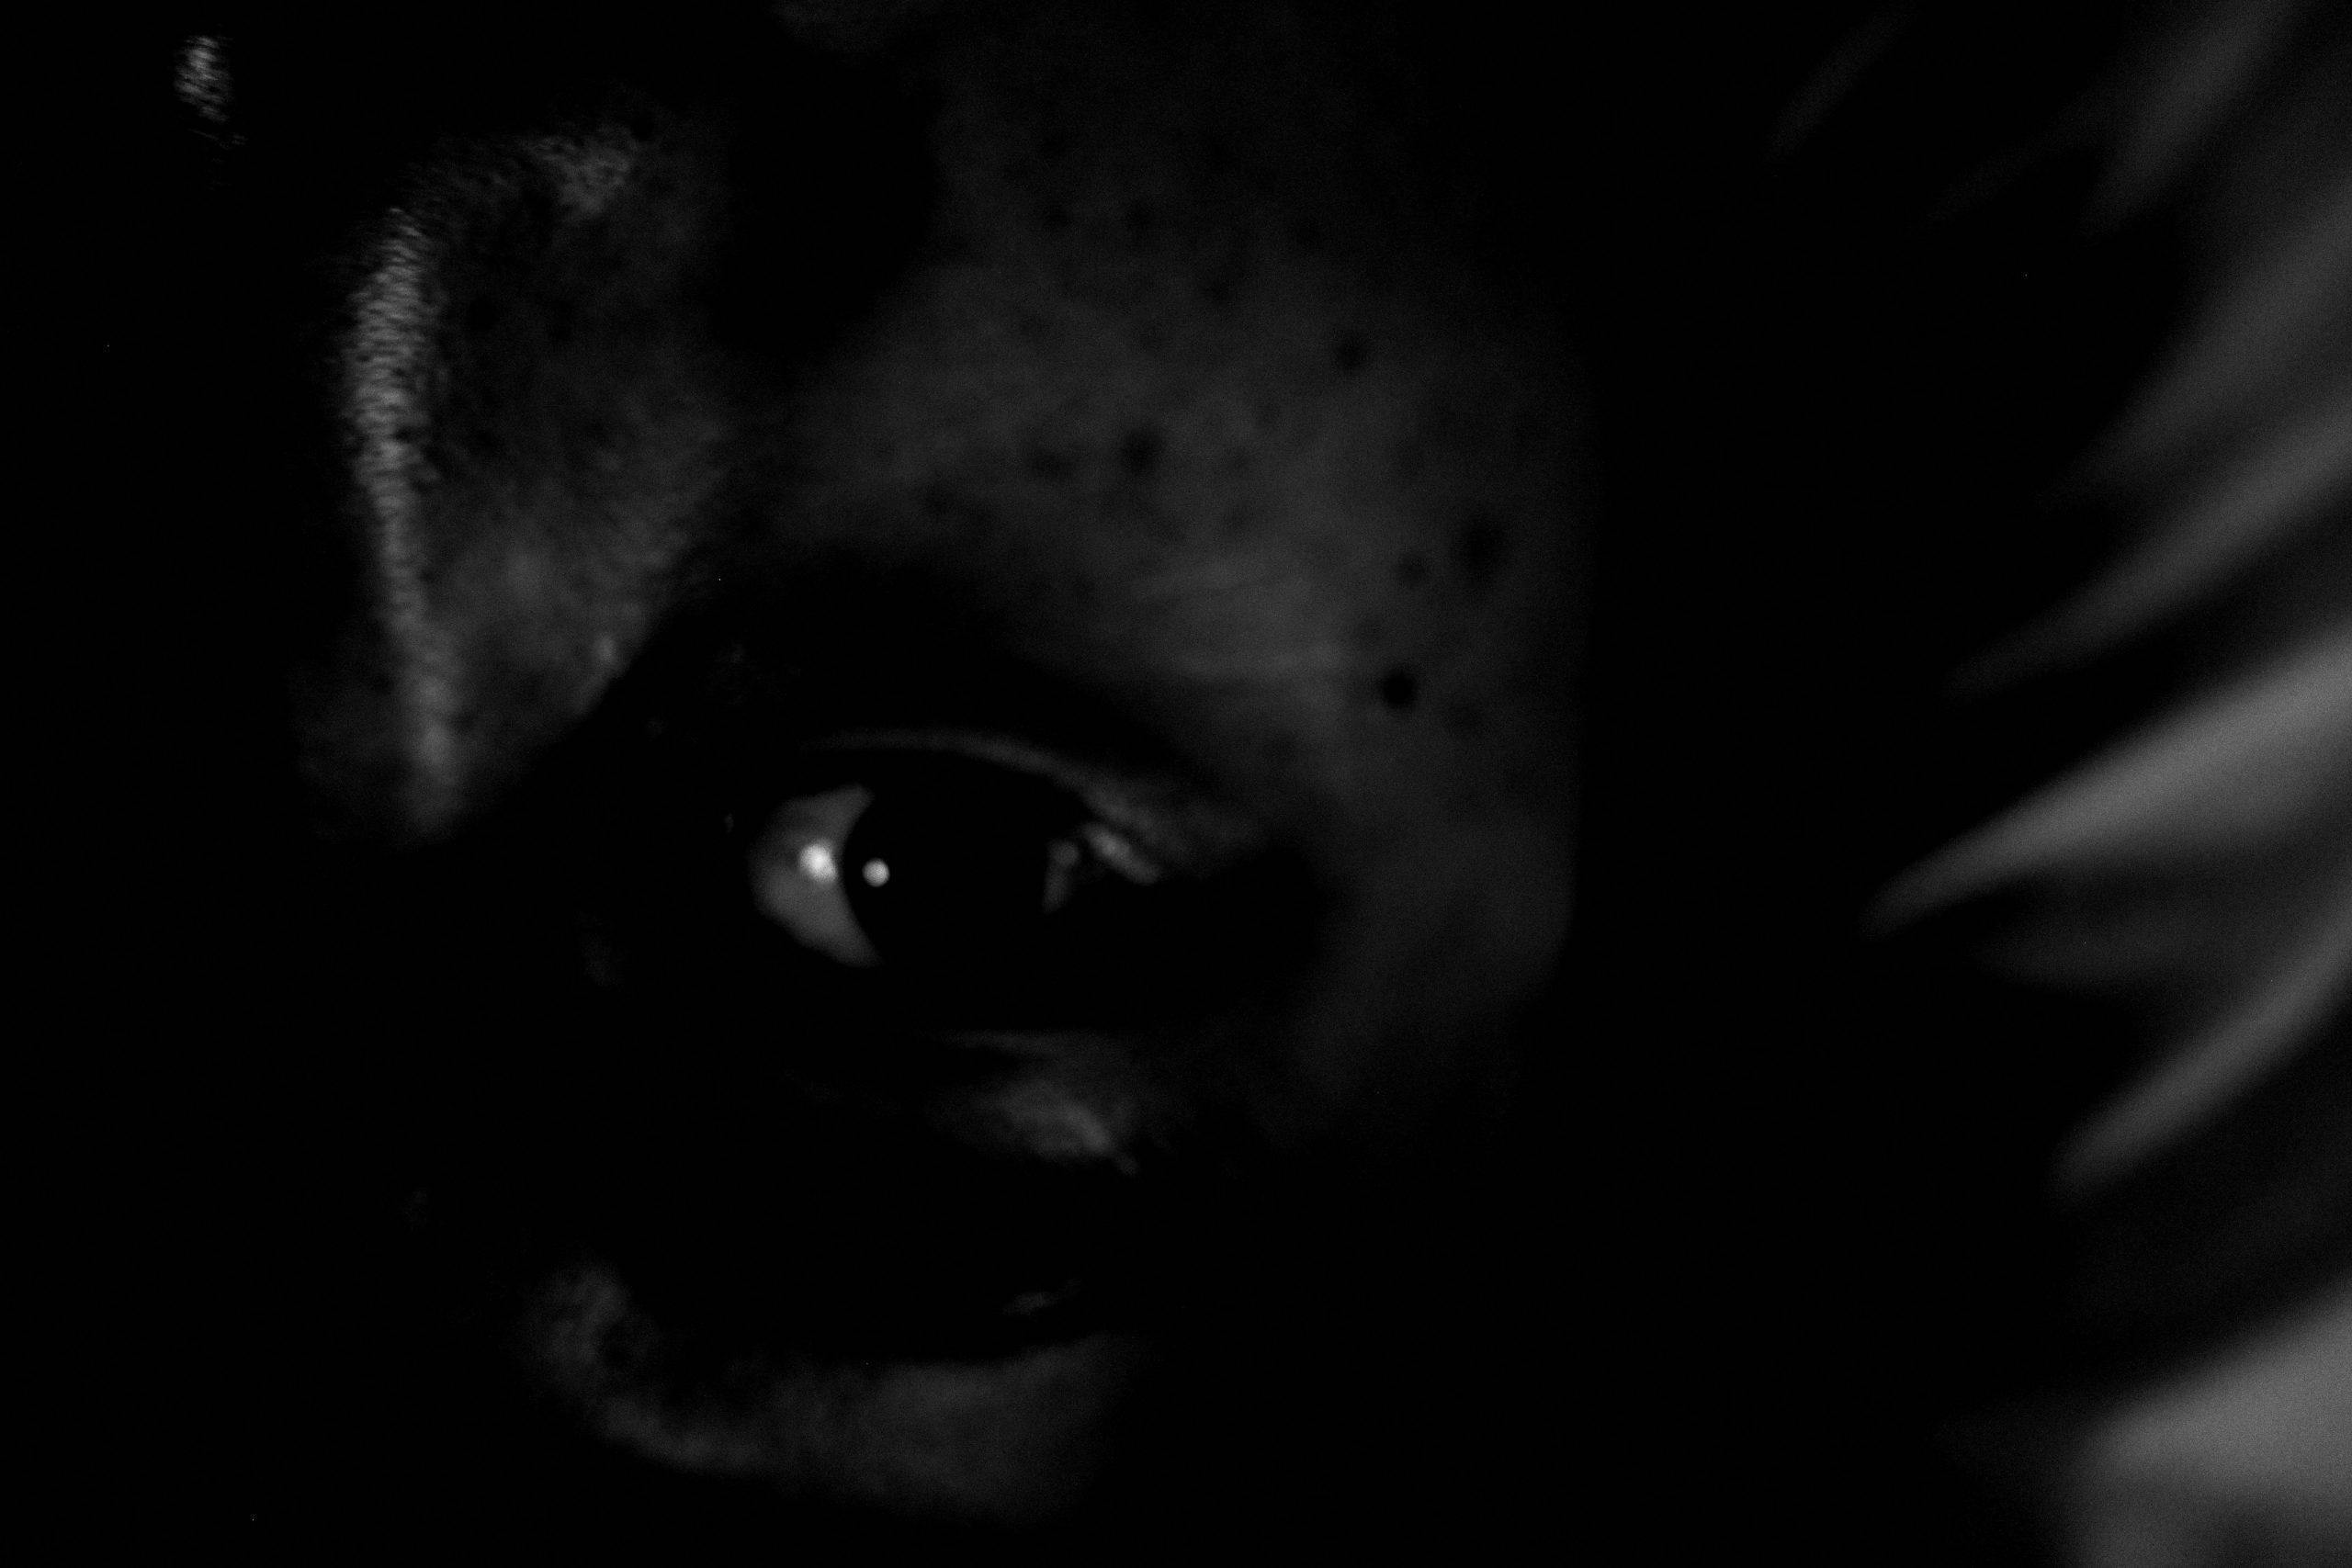 selfie black and white eye ERIC KIM low key low exposure